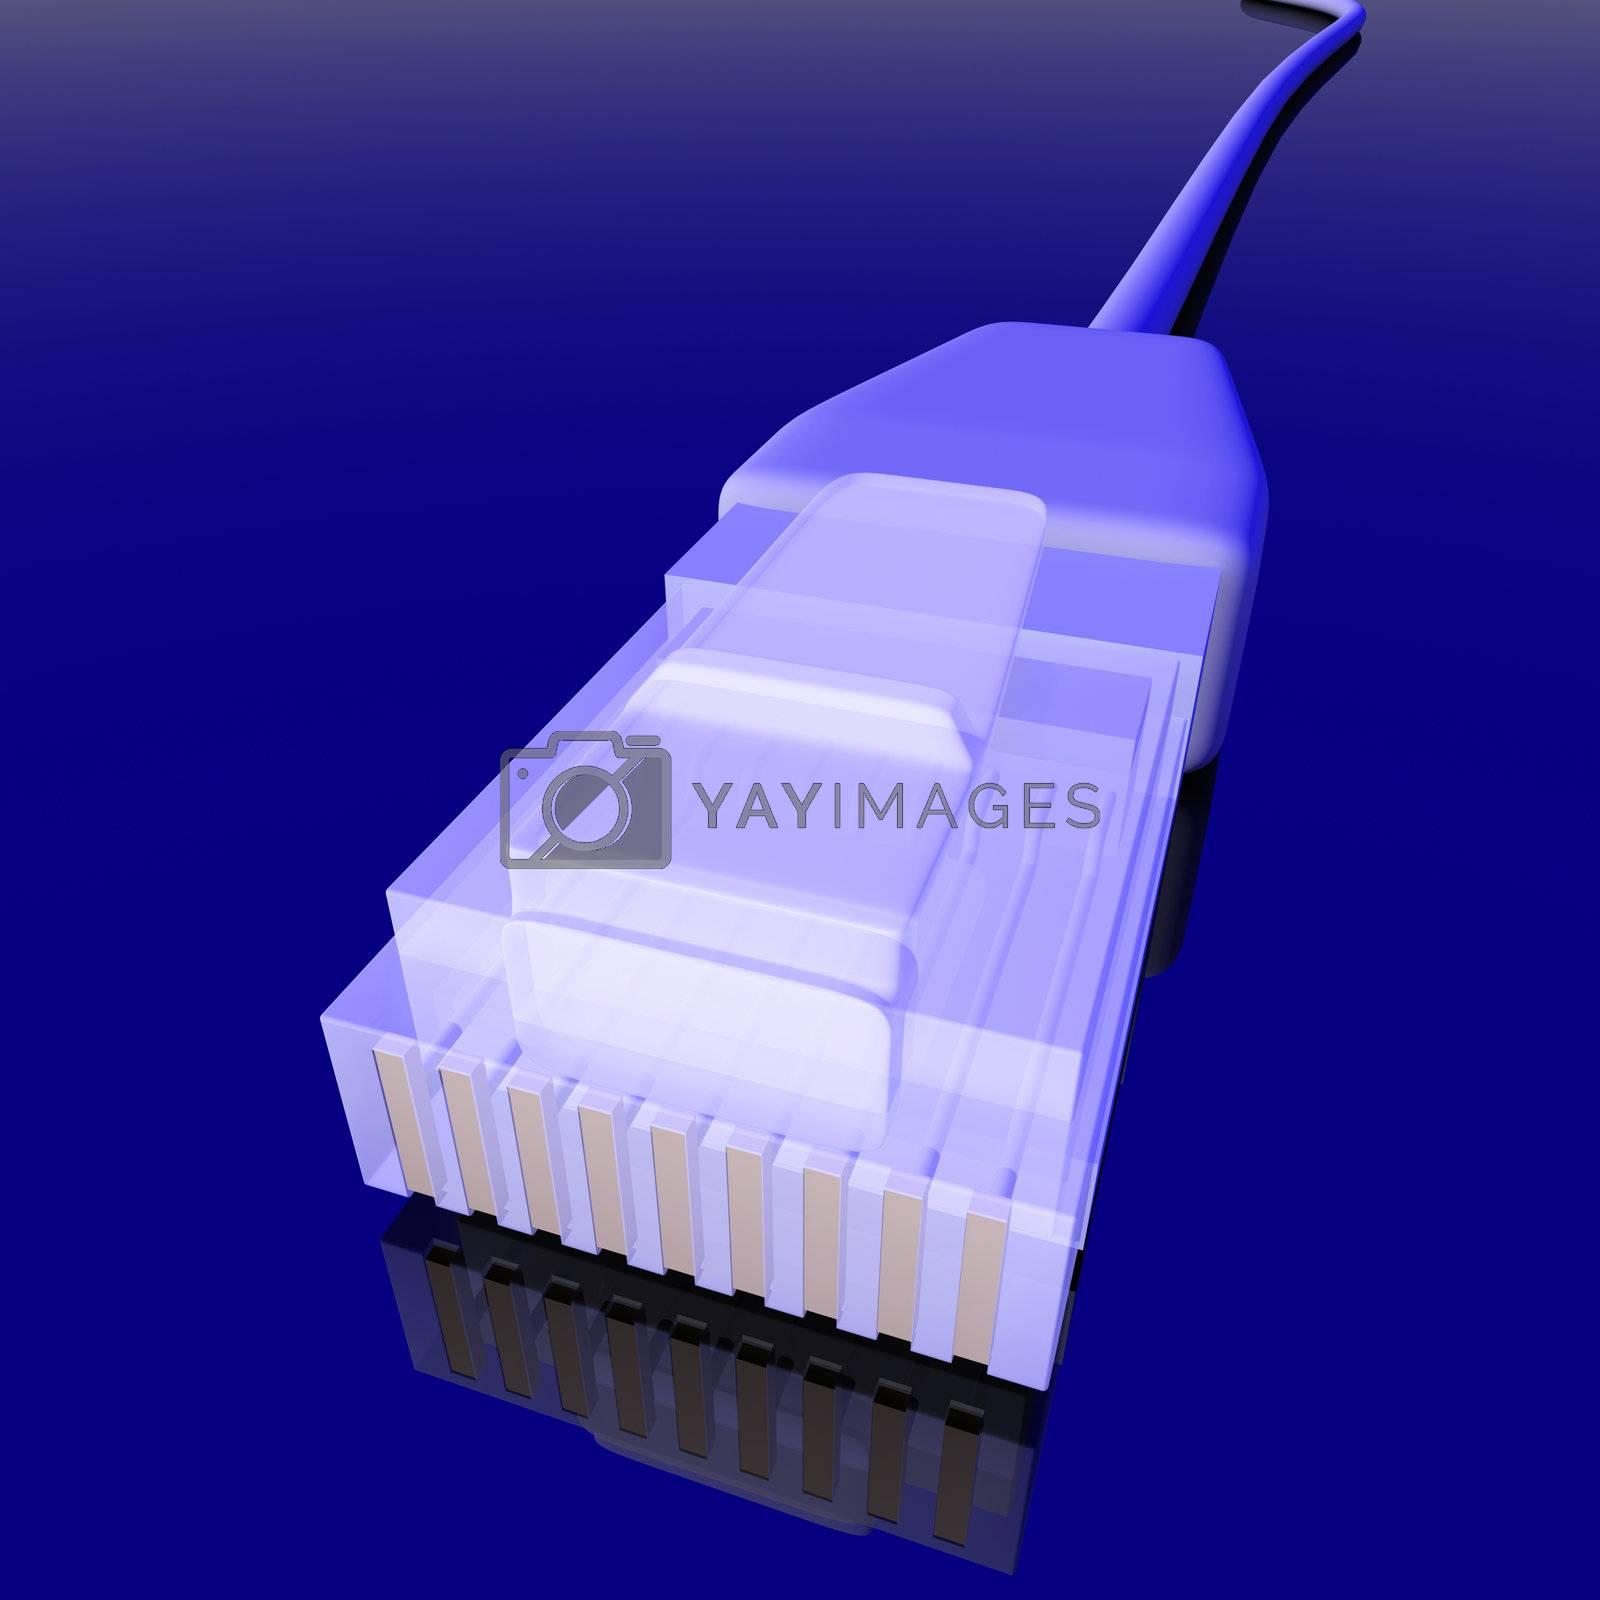 3d rendered LAN / Network Cable. Dark Environment. Intentional unbalanced lightning.